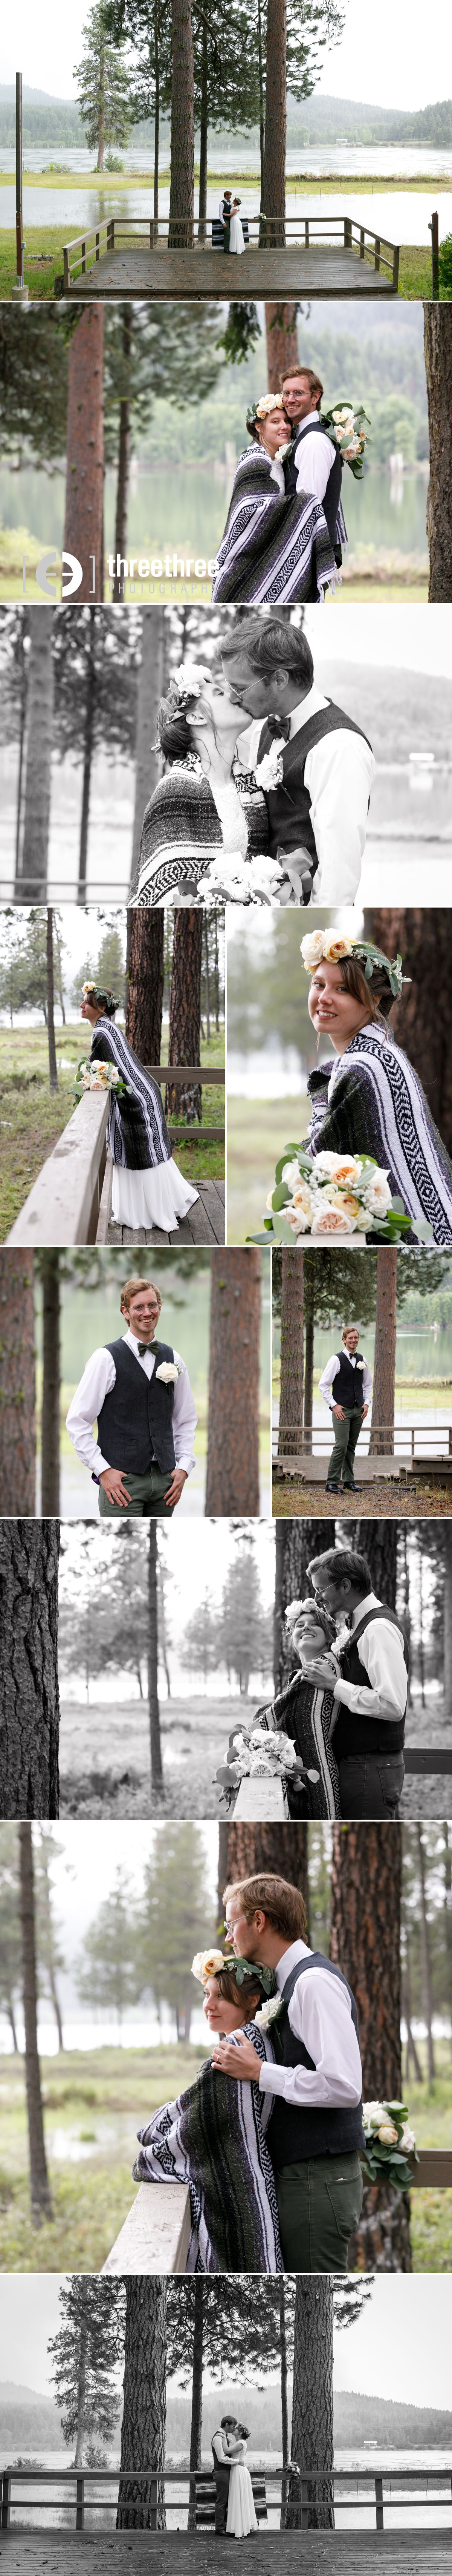 Kira Wedding Blog 9.jpg